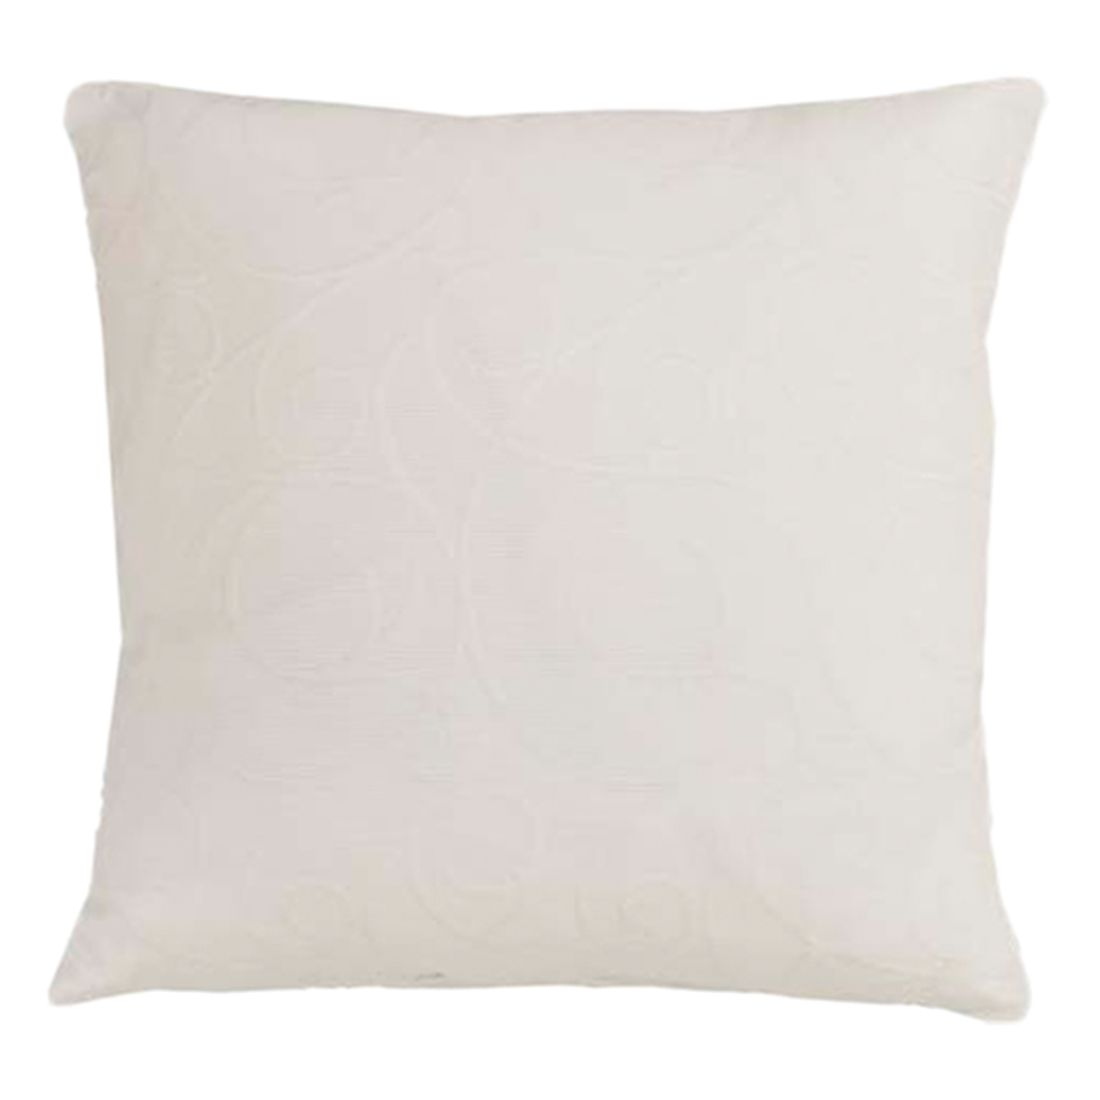 Kissenhülle Uni-Basic I – Weiß – 40 x 40 cm, Apelt kaufen